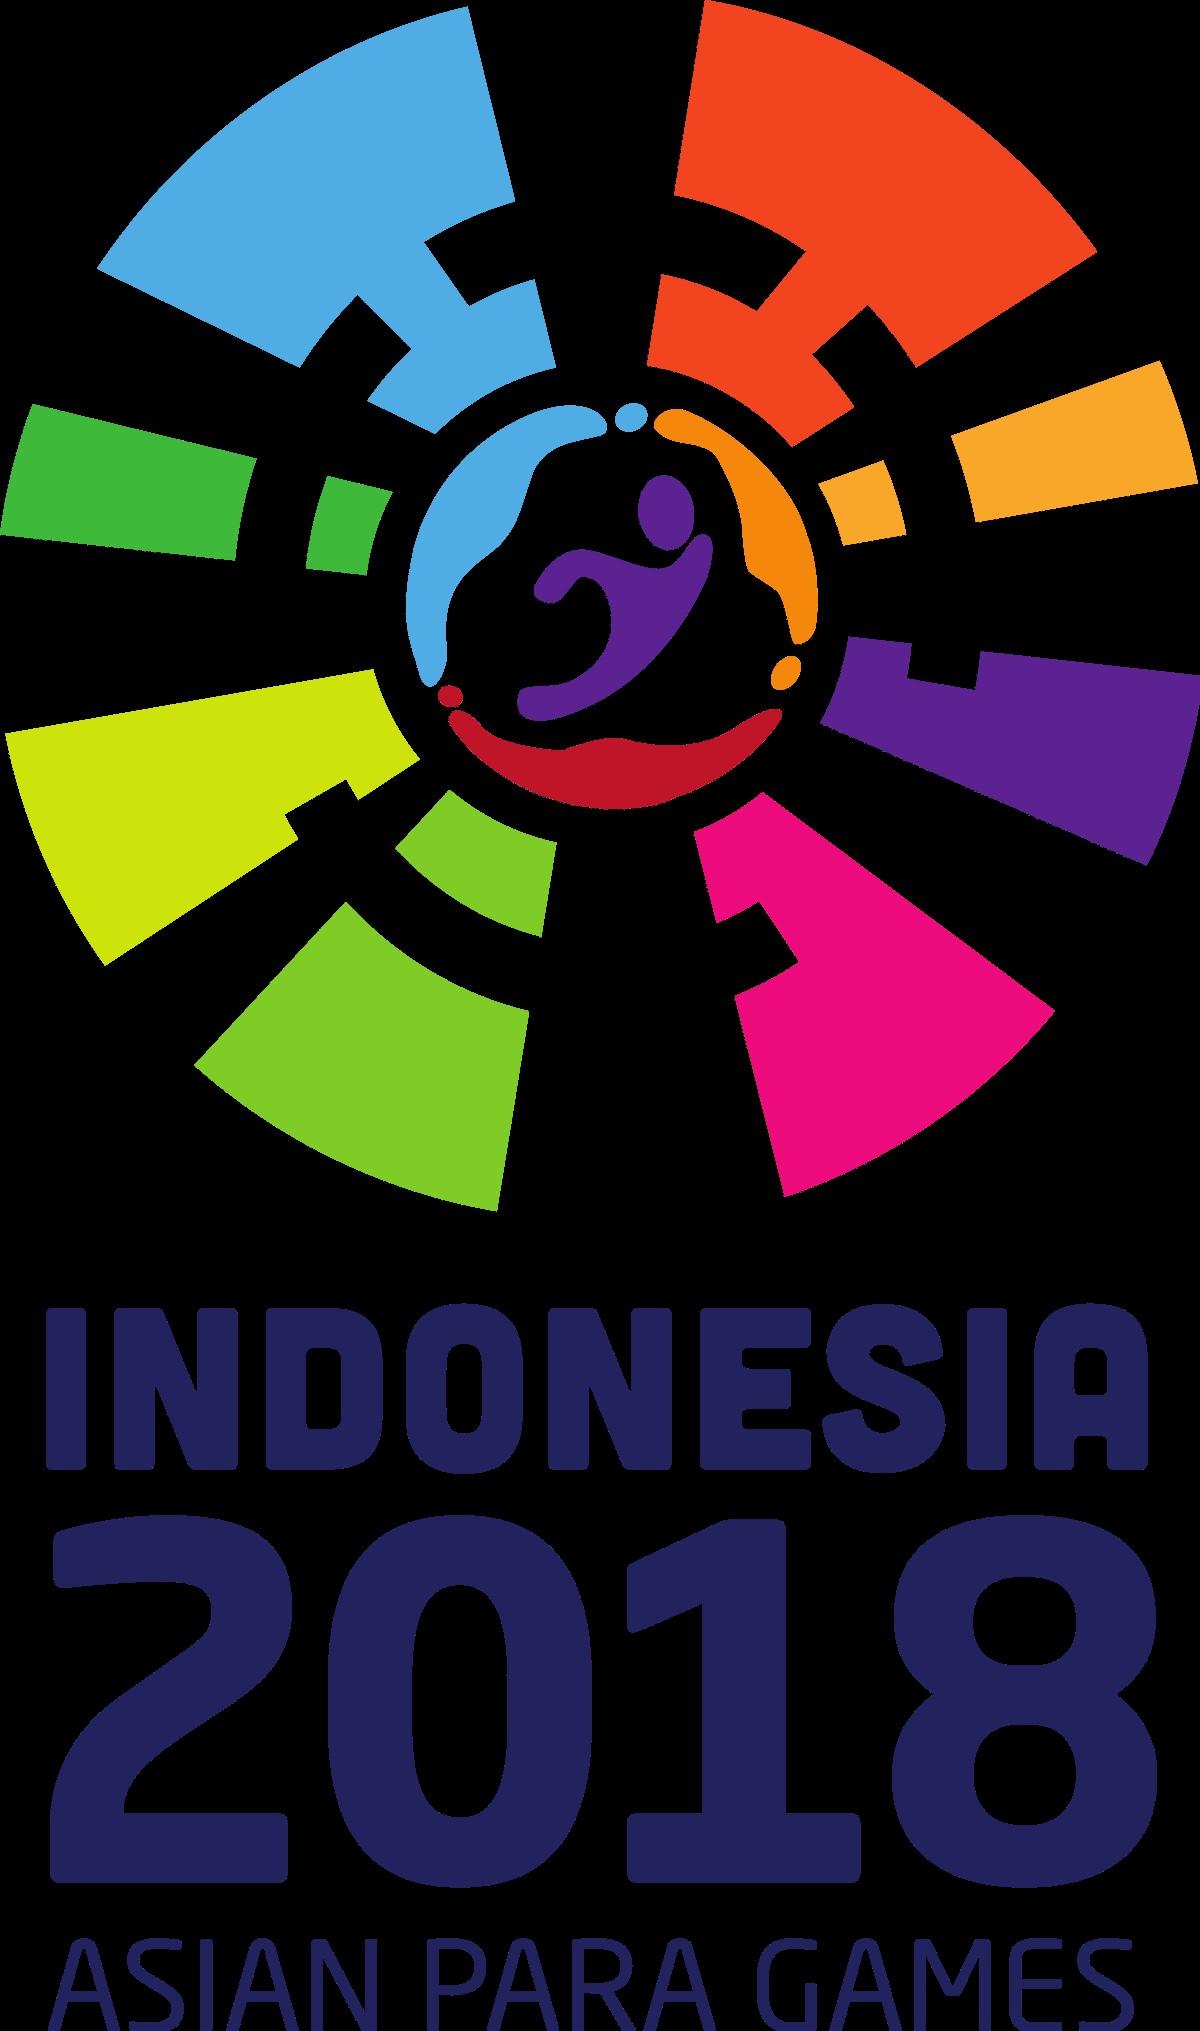 Calendar online indonesia calendar three year 1200x2031 Printable maldives 2018 calendar indonesia newspictures